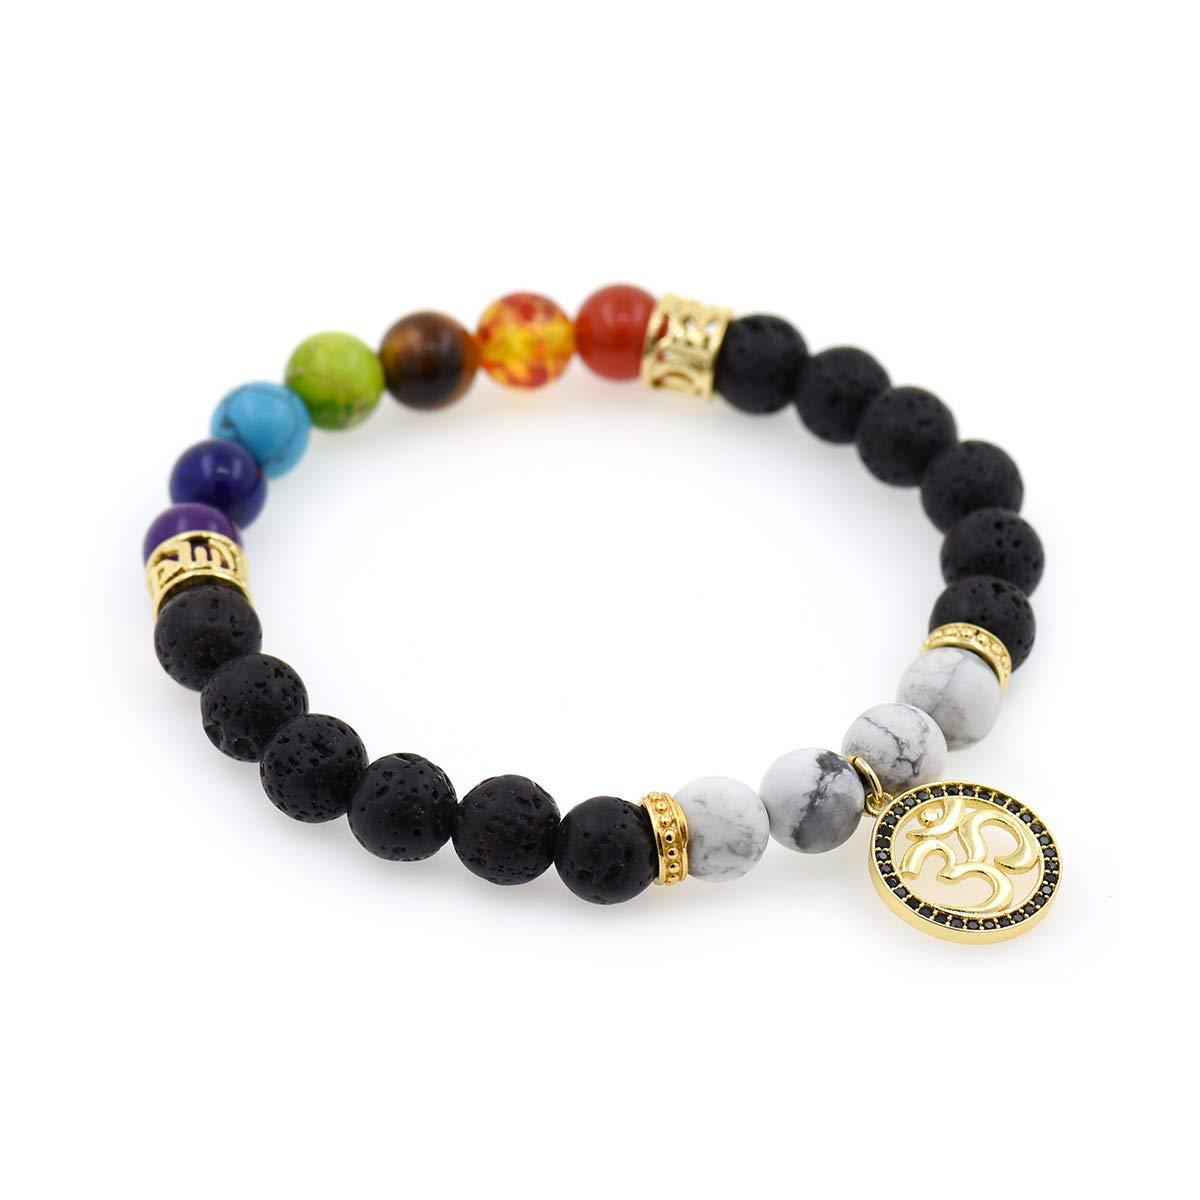 7 Chakra Meditation Bracelet,8mm Healing Lava Rock Gemstone OM/Yoga Bracelet Charm Gift Men Women